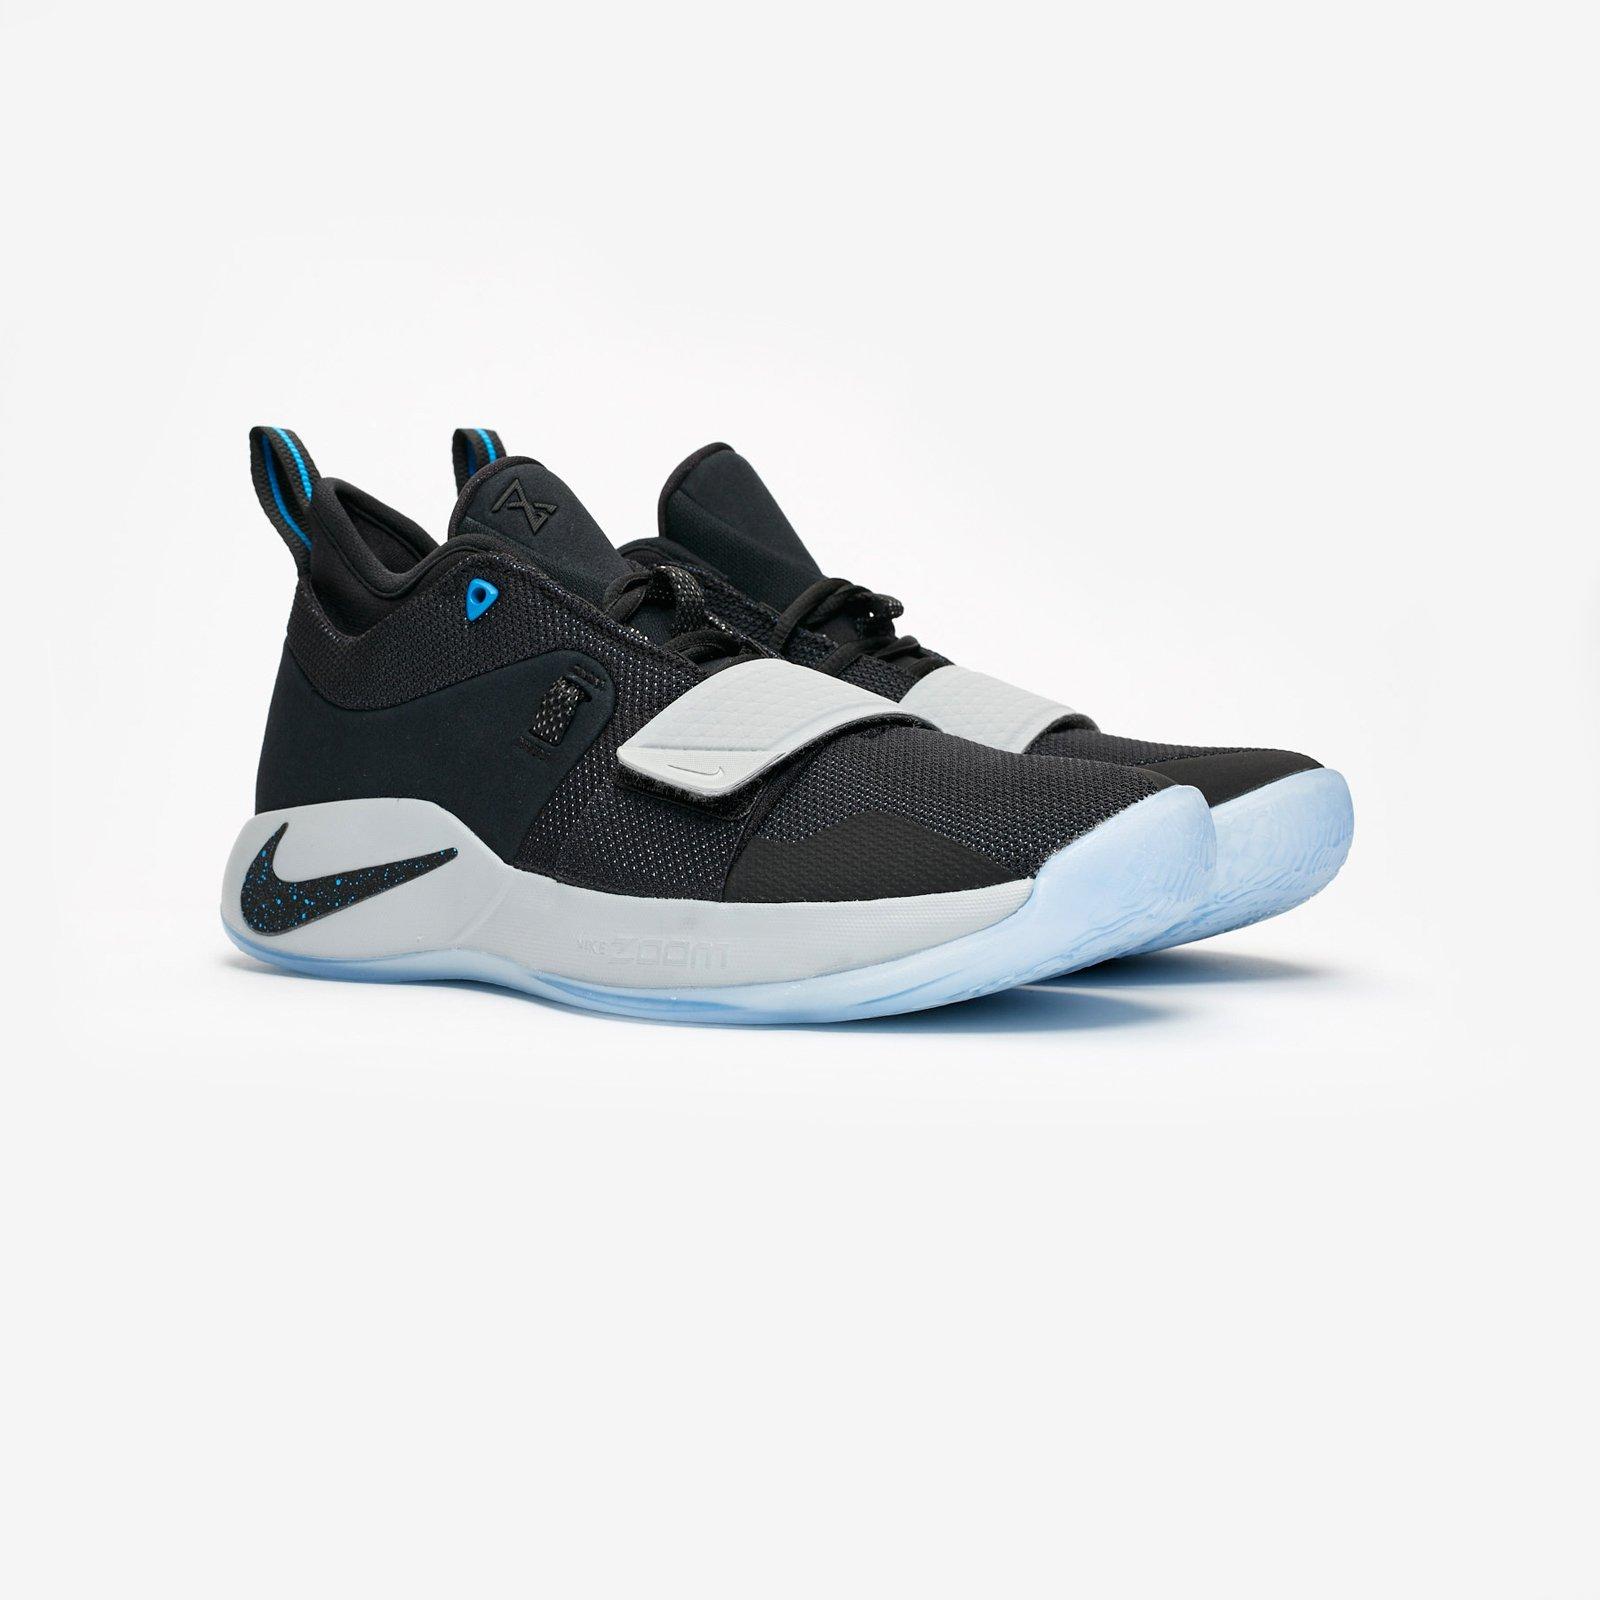 newest f29e3 589a5 Nike PG 2.5 - Bq8452-006 - Sneakersnstuff | sneakers ...